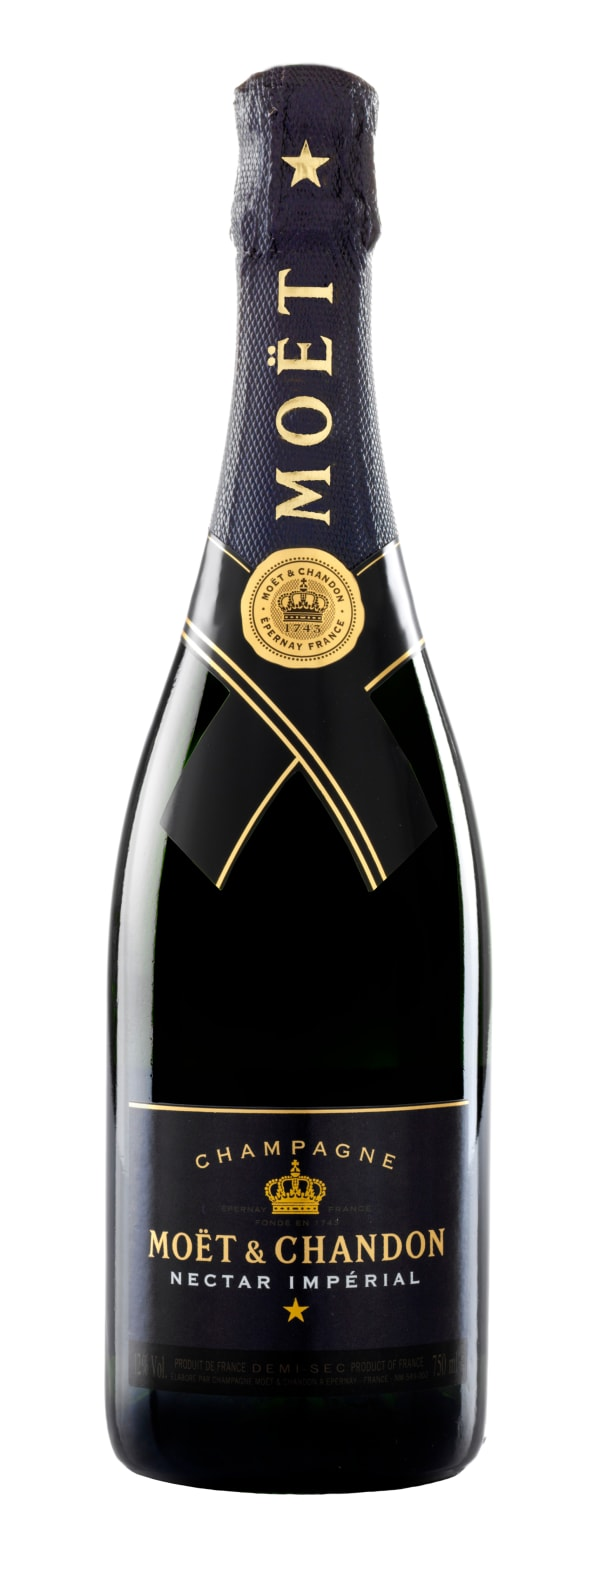 Moët & Chandon Nectar Impérial Champagne Demi Sec